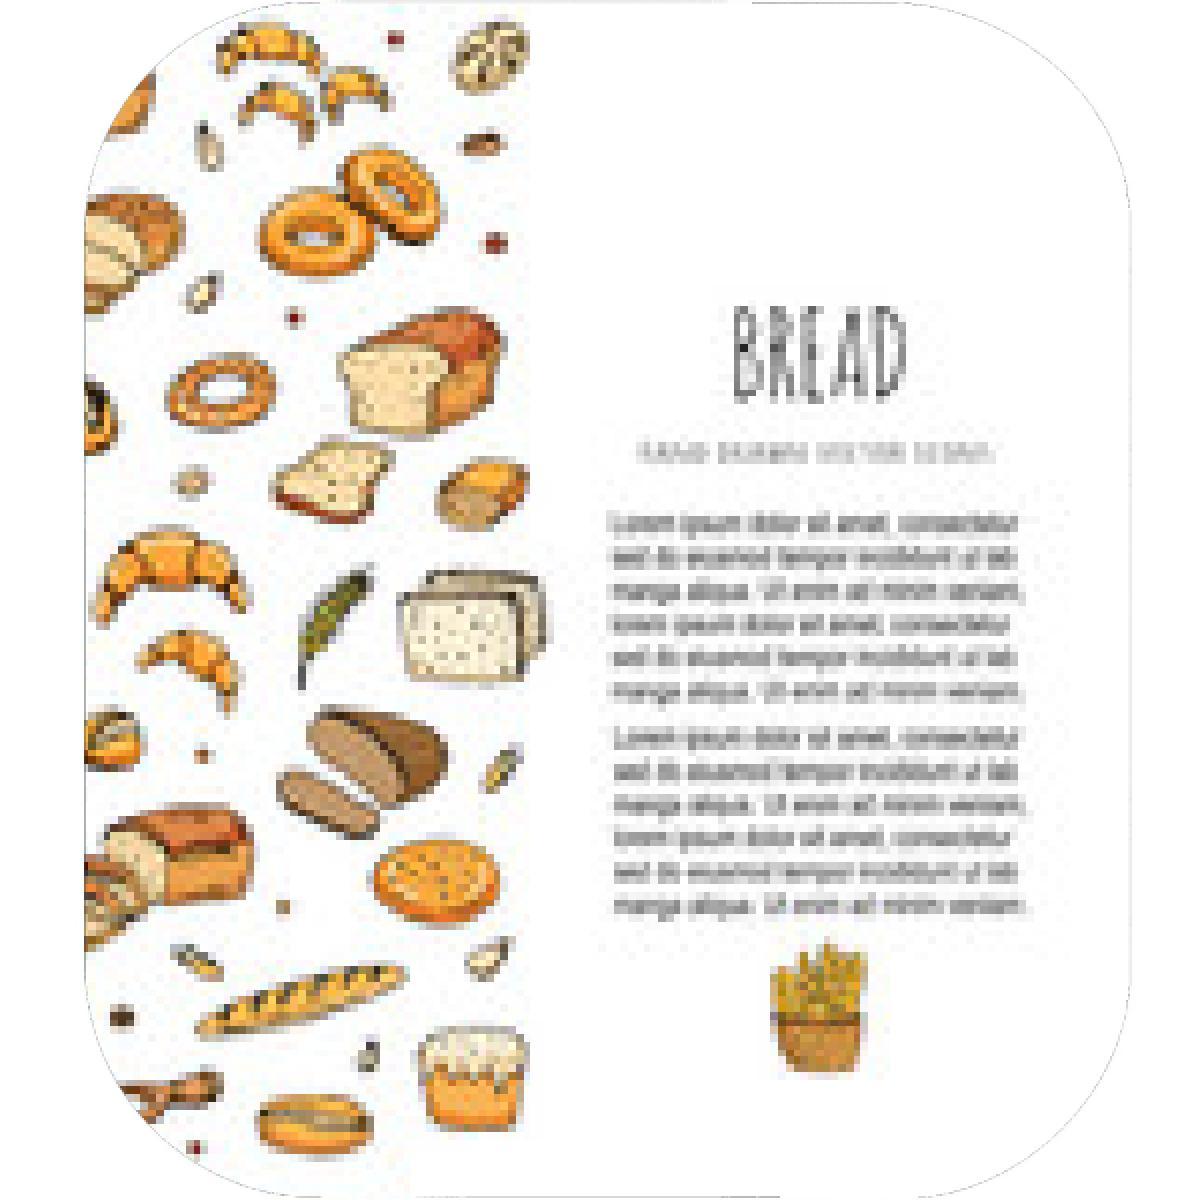 Bagel clipart bagette. Free baguette download clip